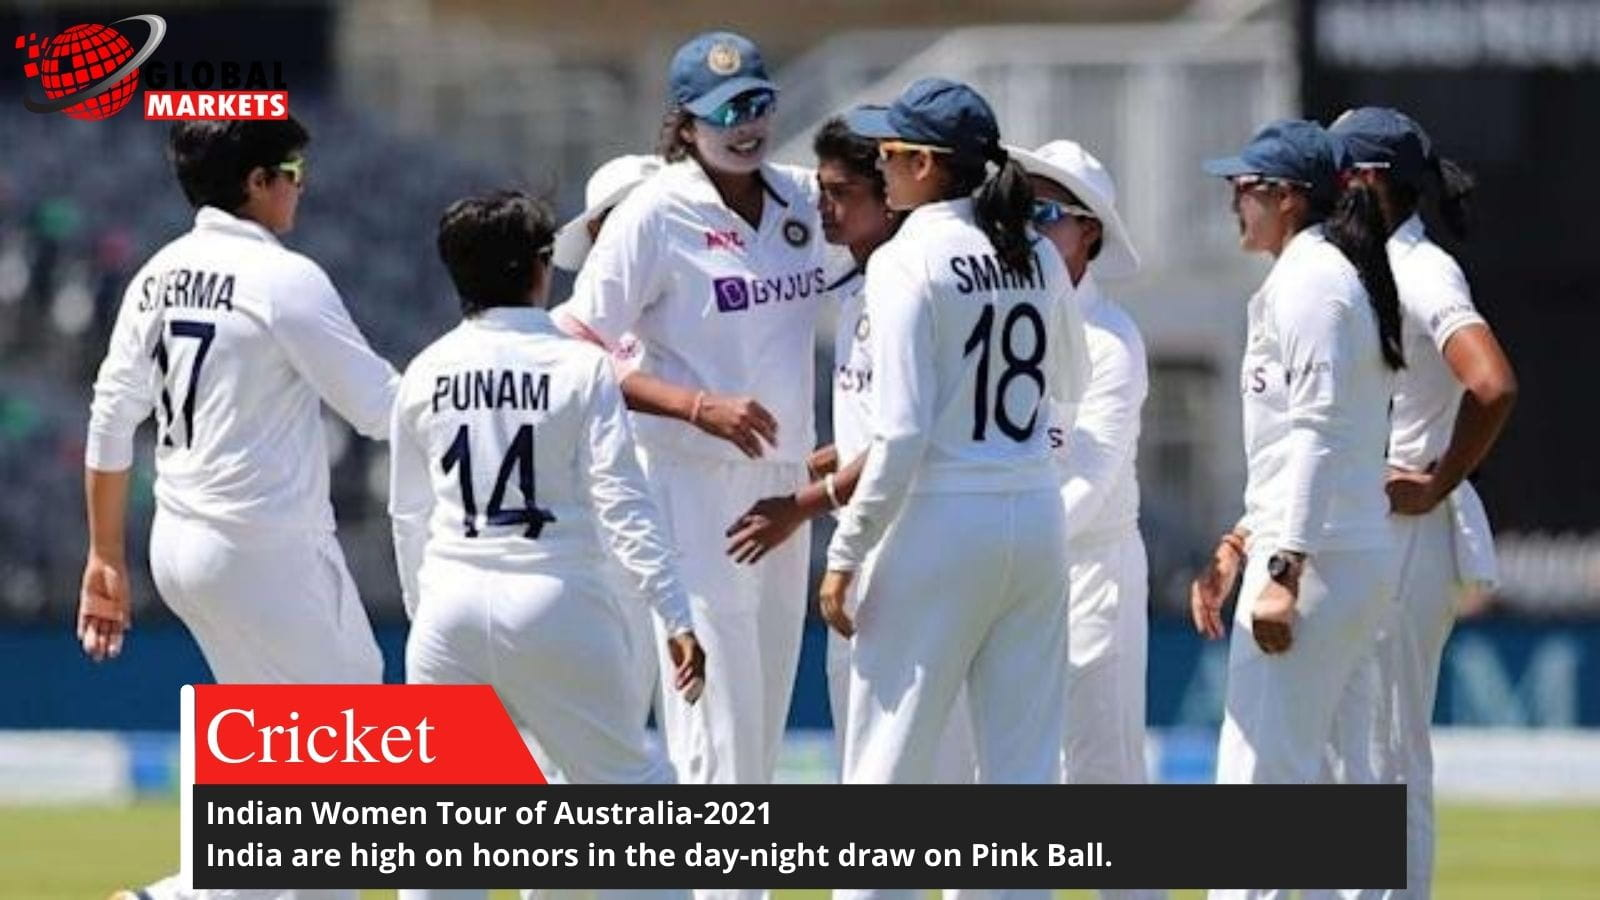 Indian Women Tour of Australia-2021, First  Day-night Test  draw.